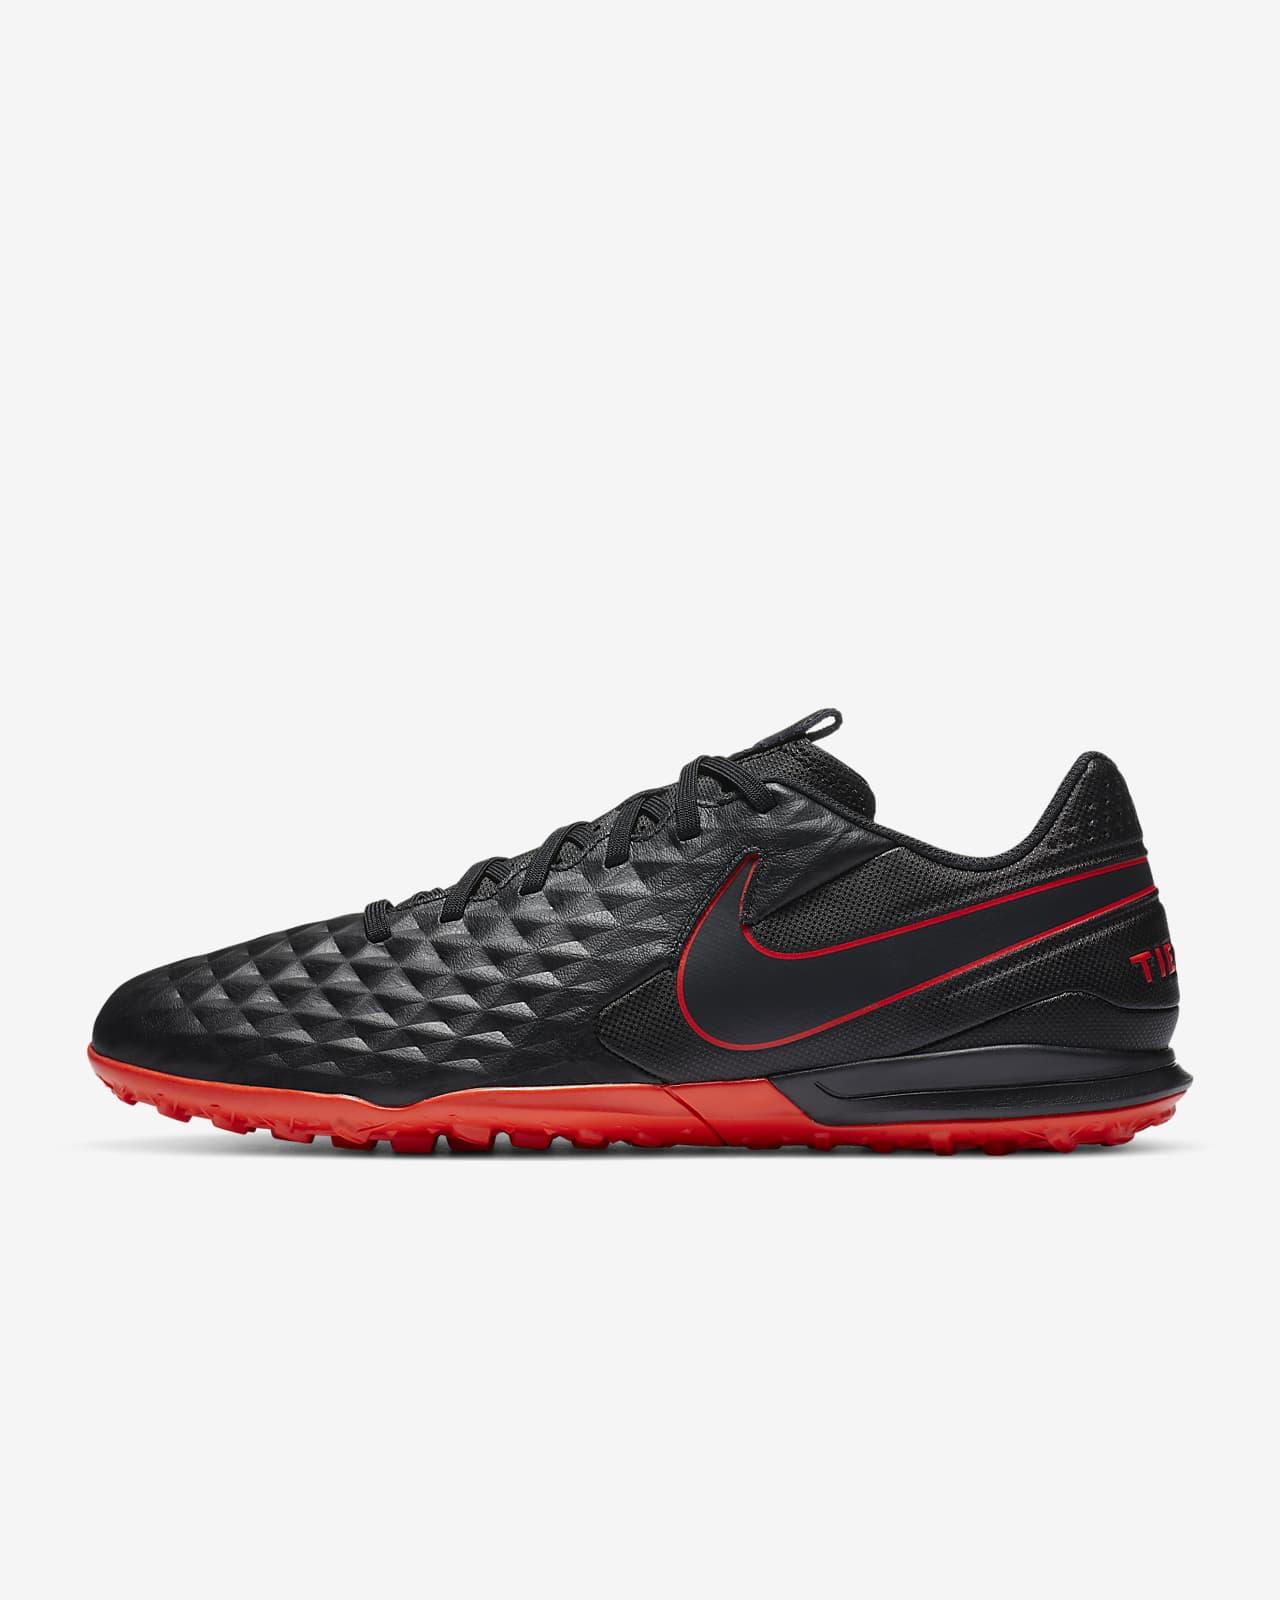 Nike Tiempo Legend 8 Academy TF Artificial-Turf Football Shoe